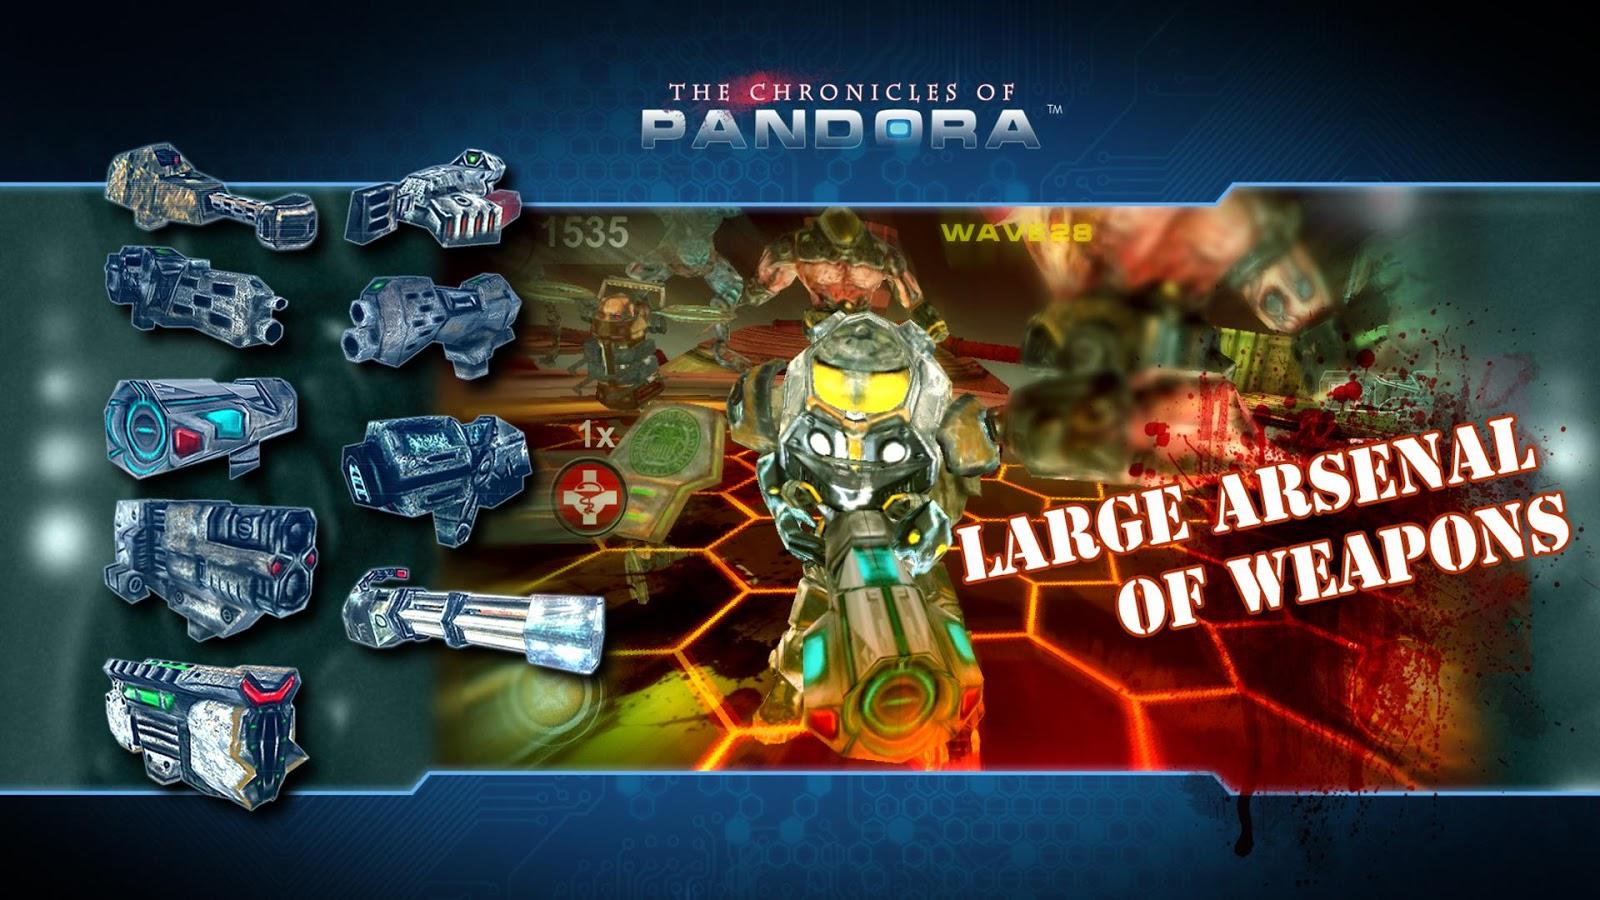 The-Chronicles-of-Pandora 31